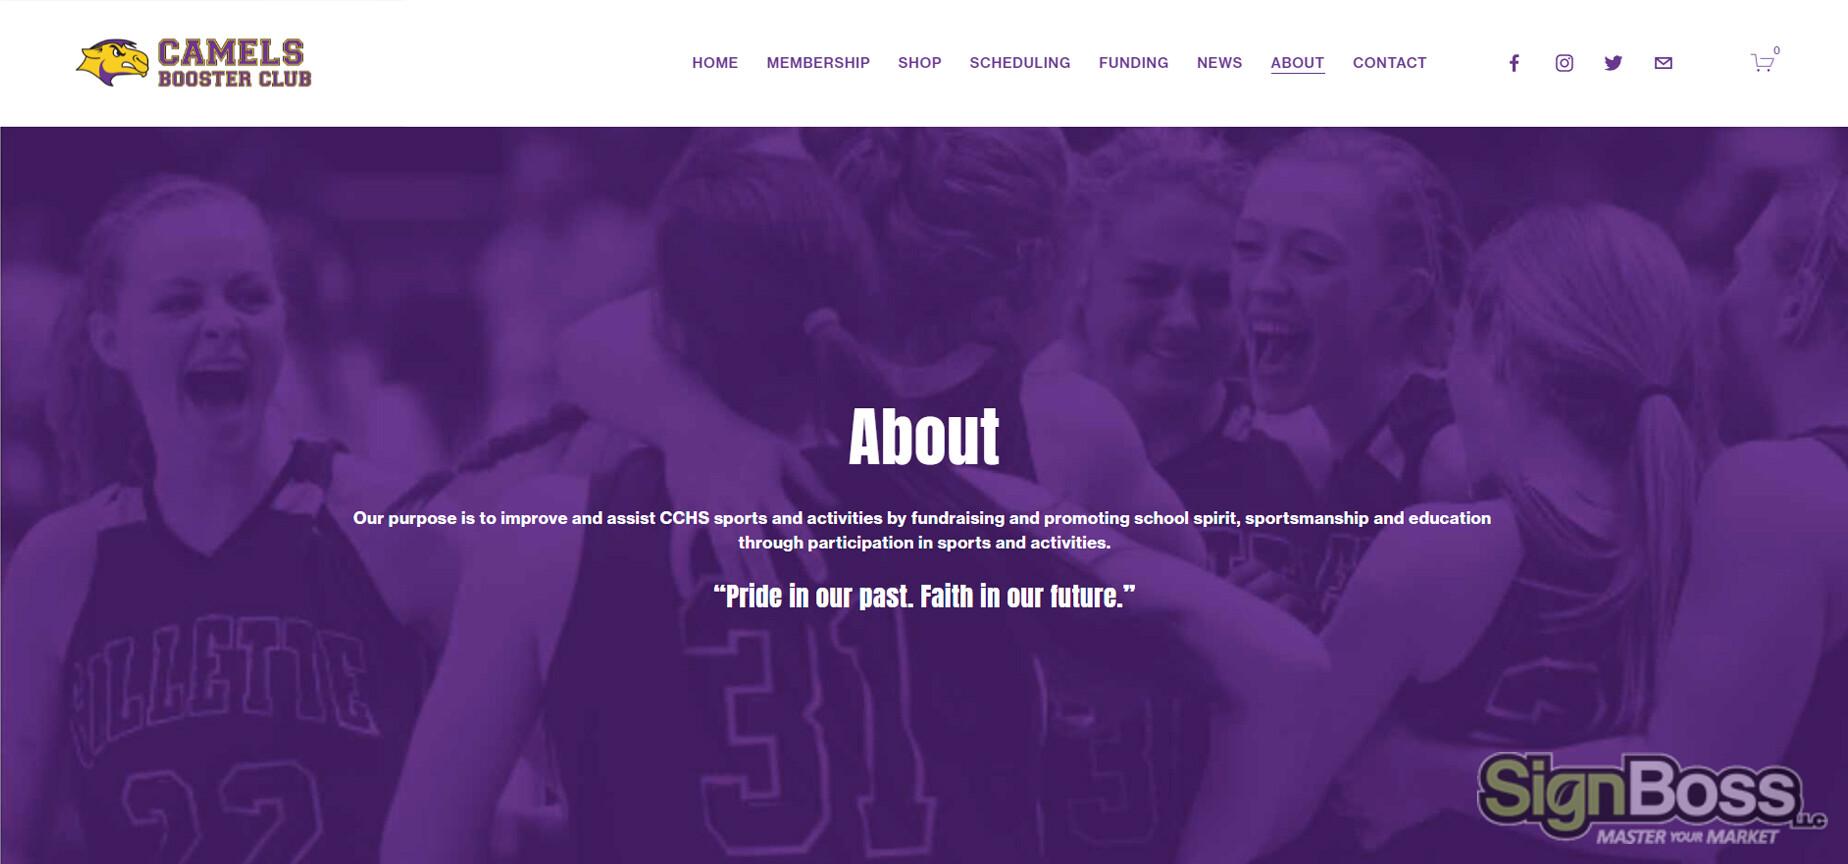 School Booster Club Websites in Gillette WY